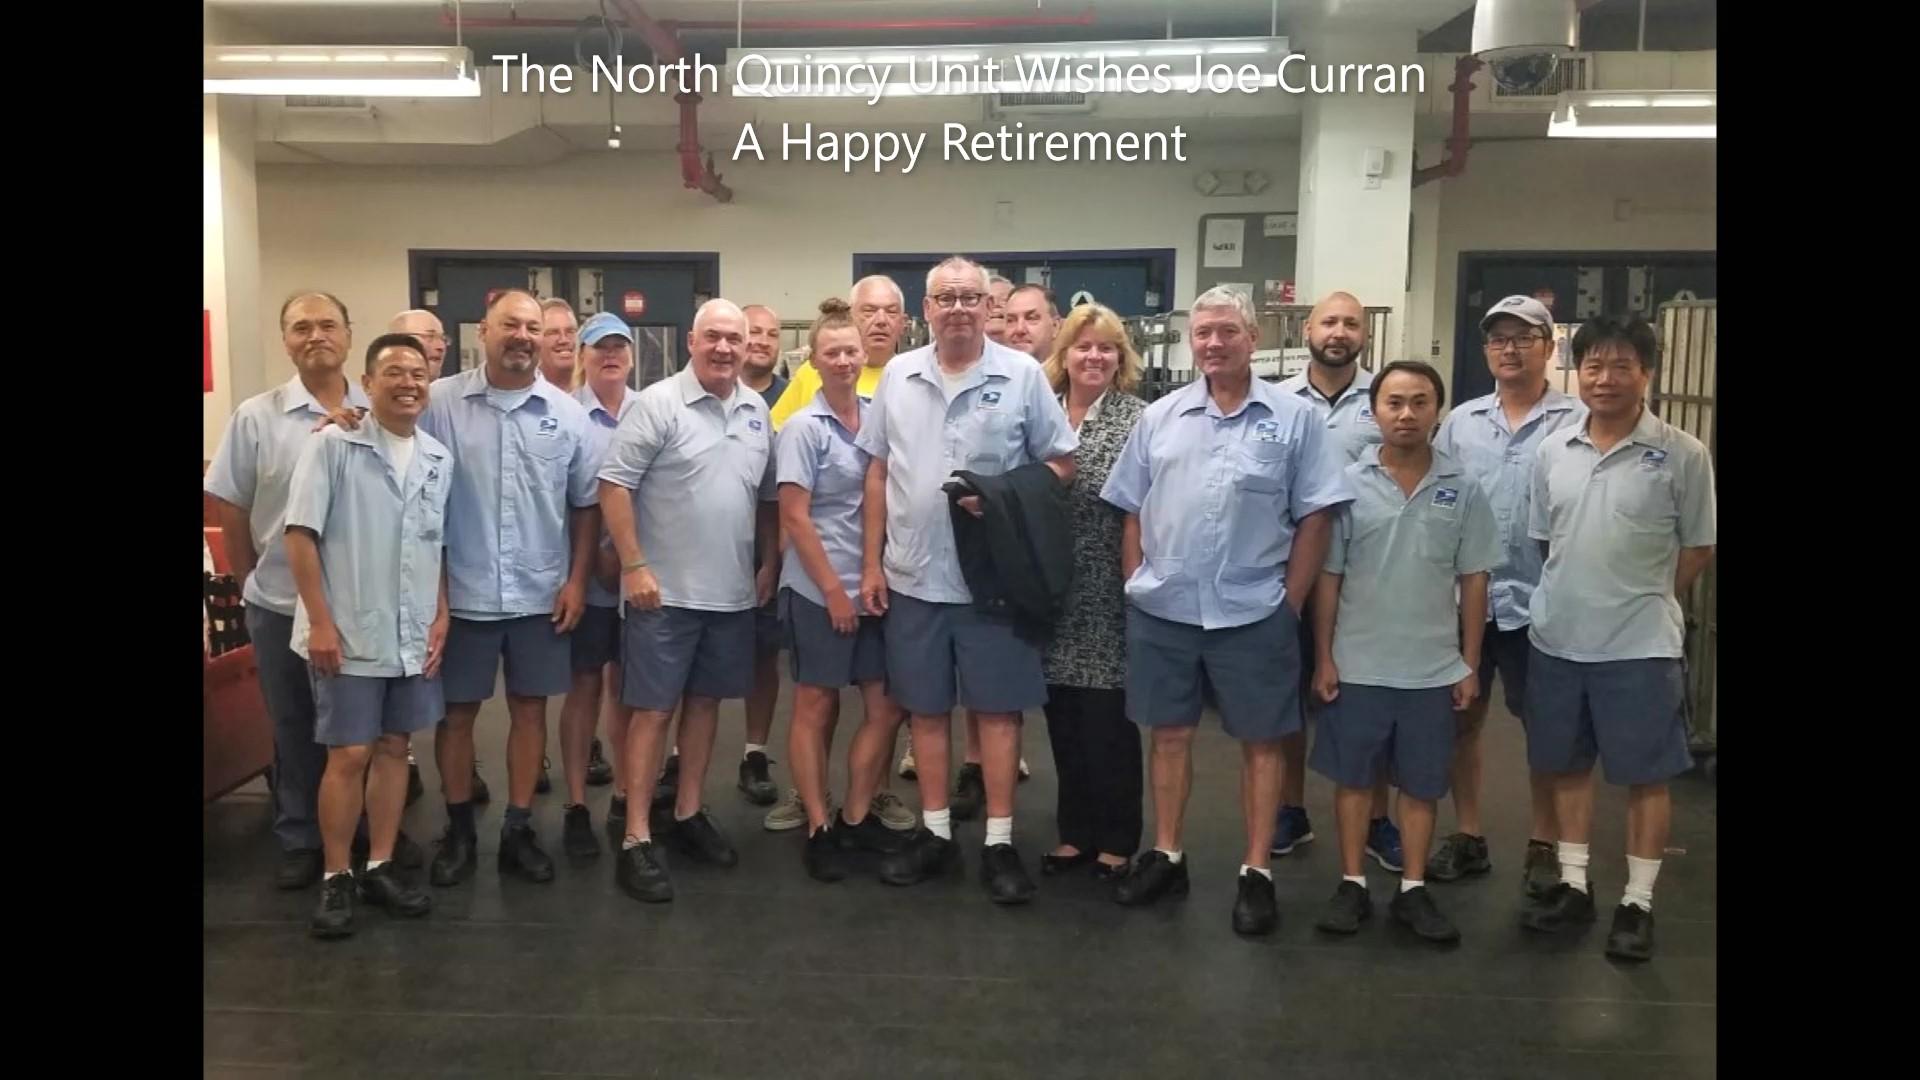 Joe-Curran-N-Quincy-62019-Retirement-3_Large_Moment